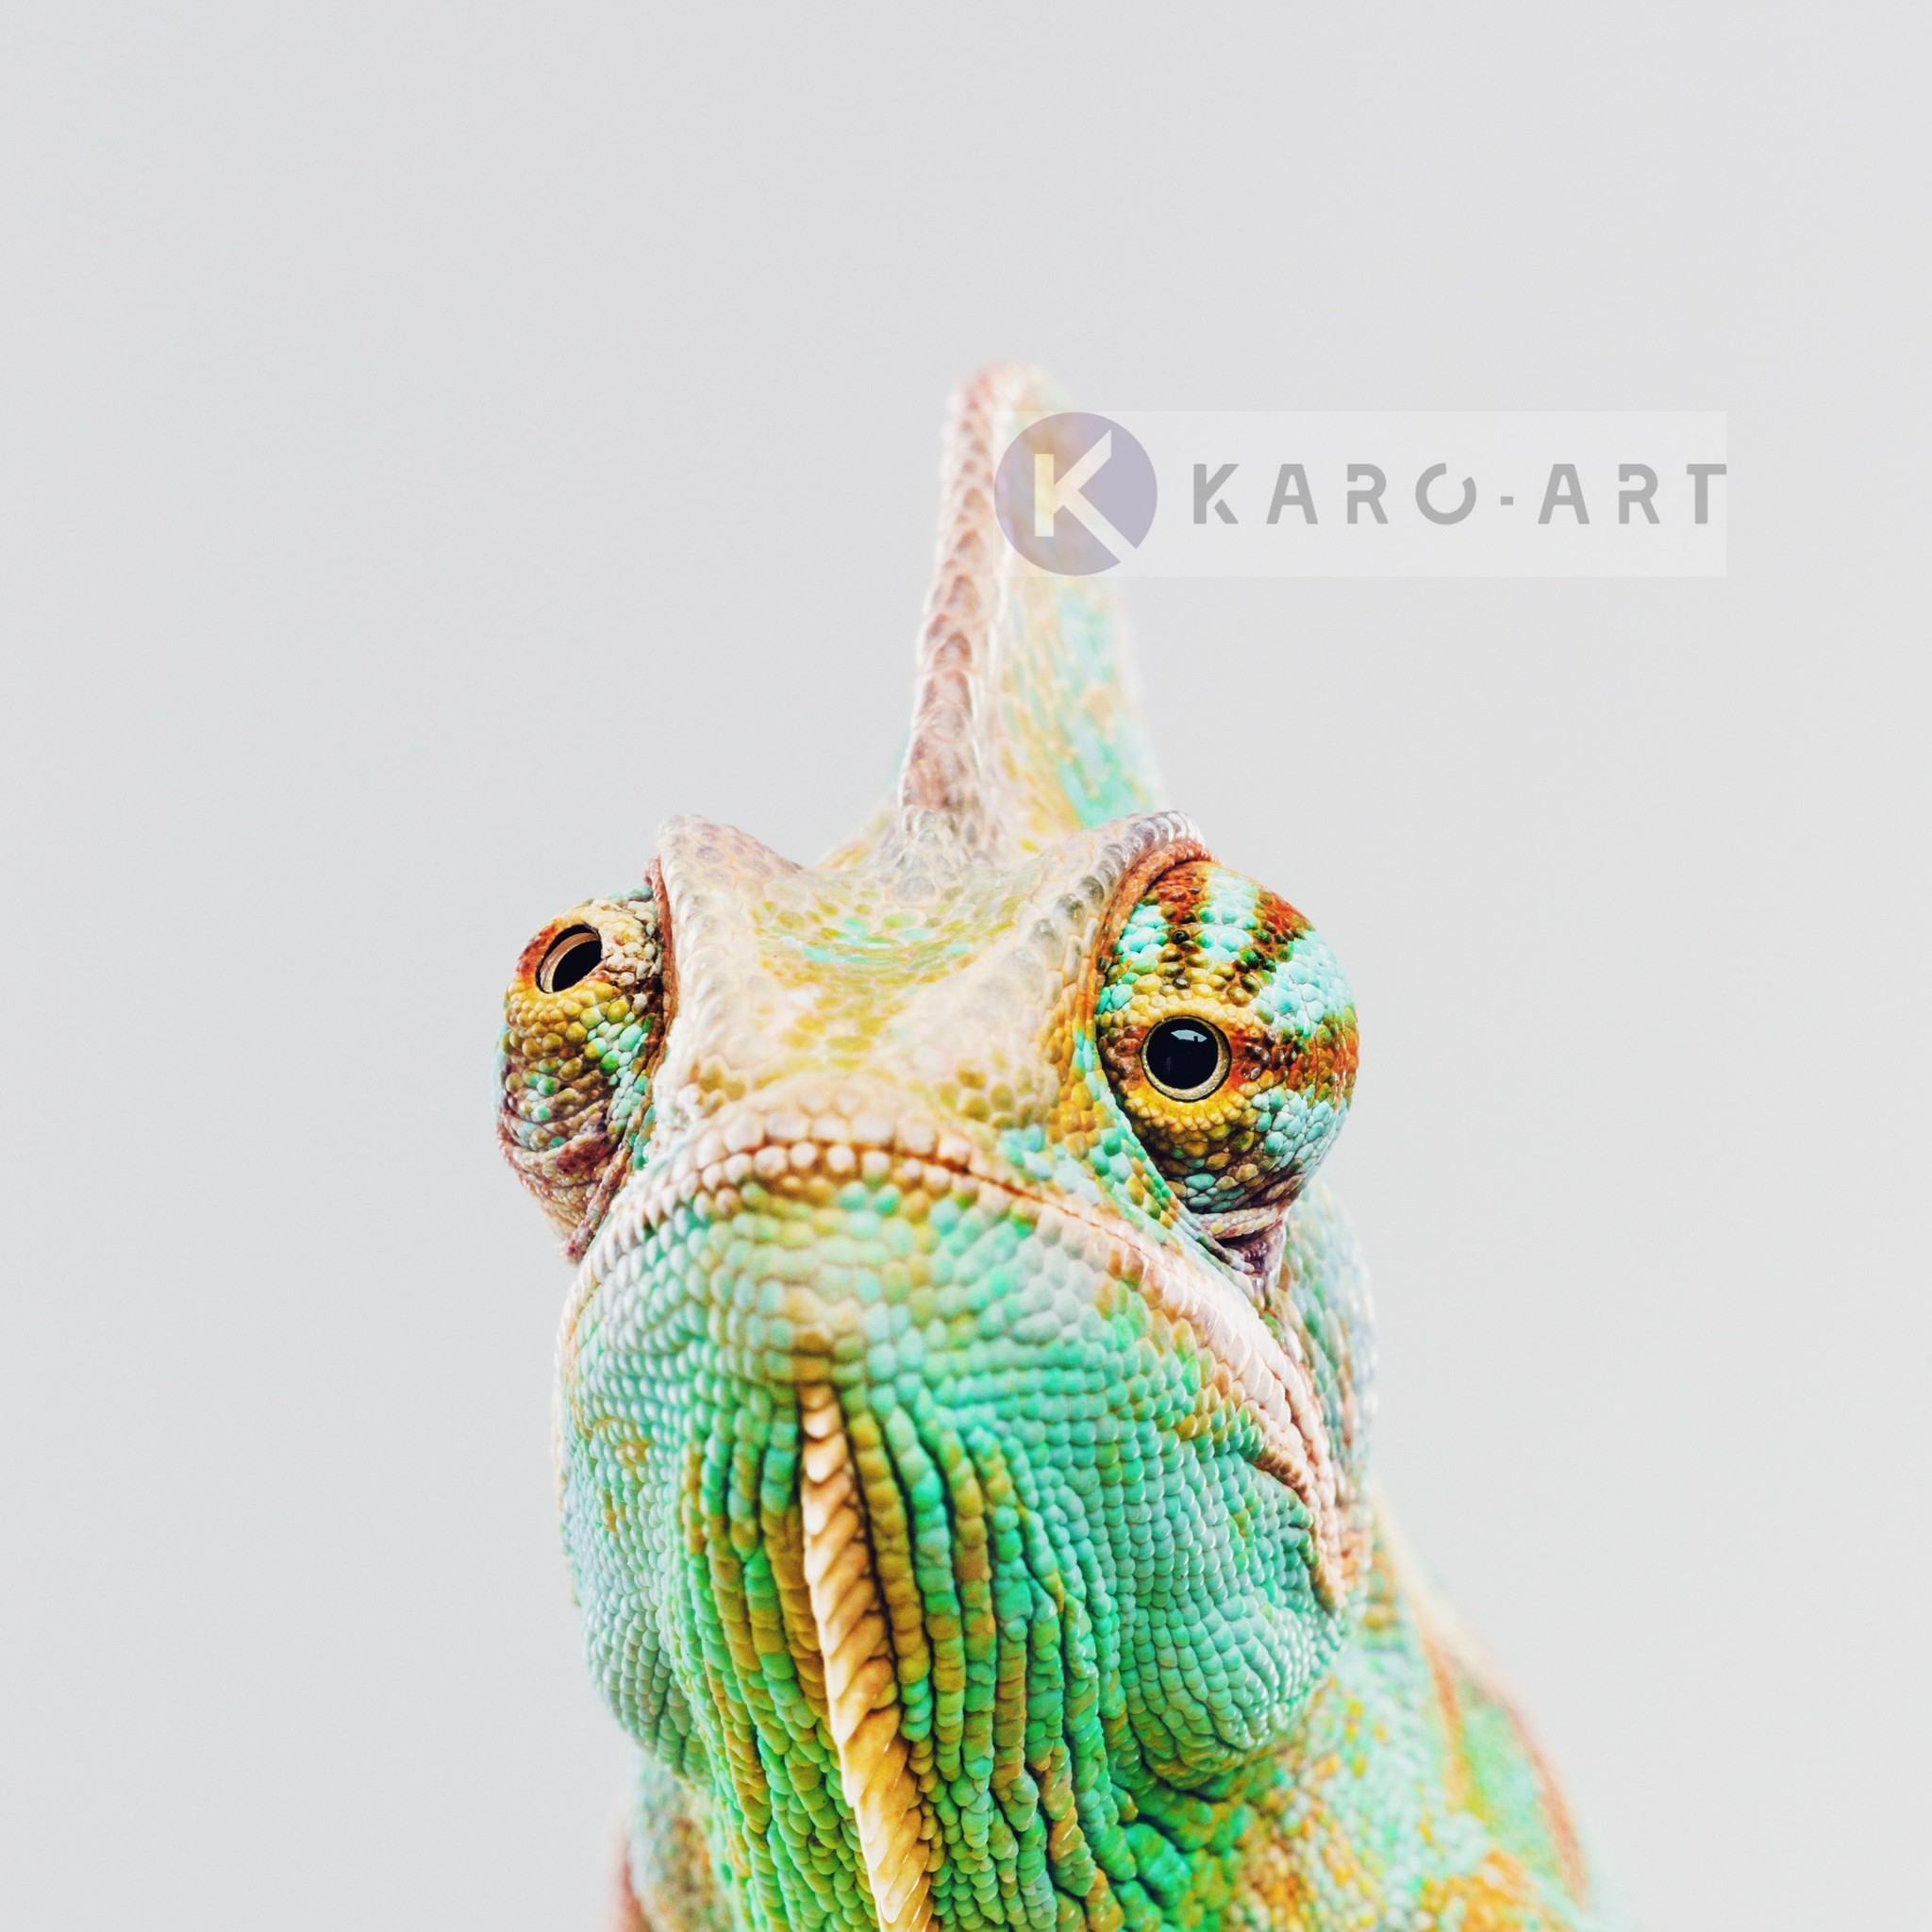 Afbeelding op acrylglas - Kameleon